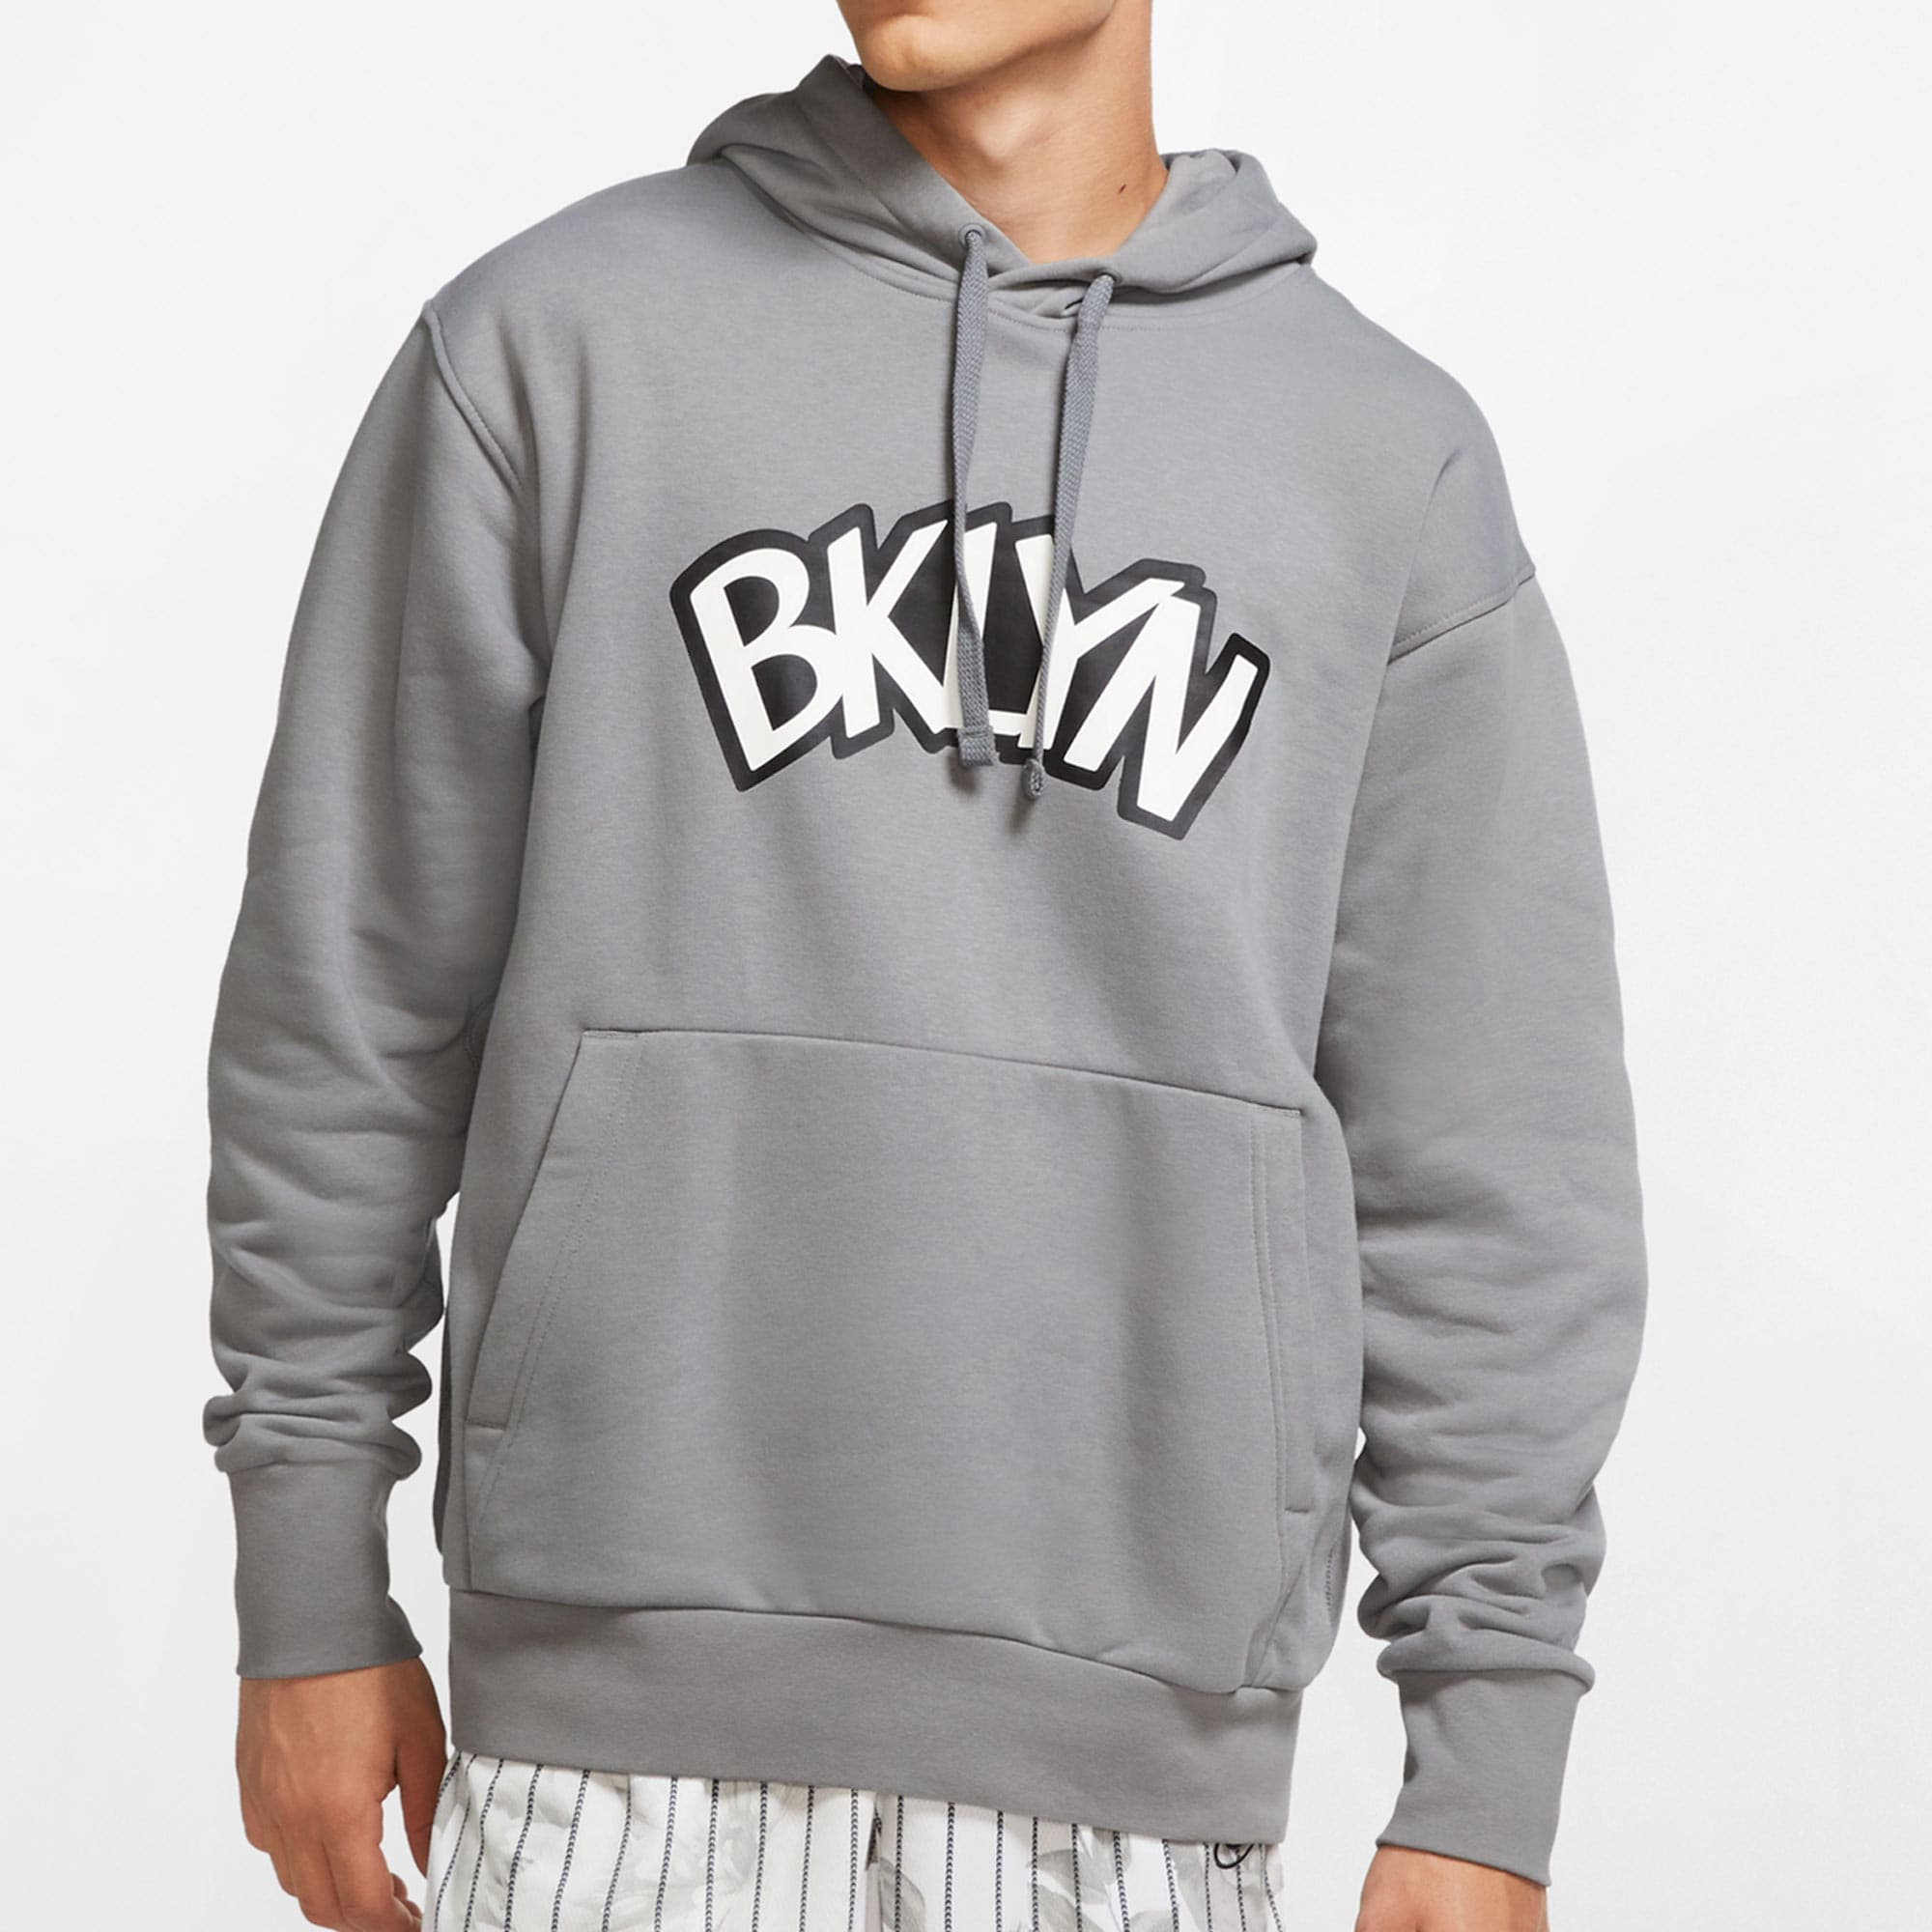 Brooklyn Nets Jordan Brand Statement Edition Pullover Hoodie - Charcoal